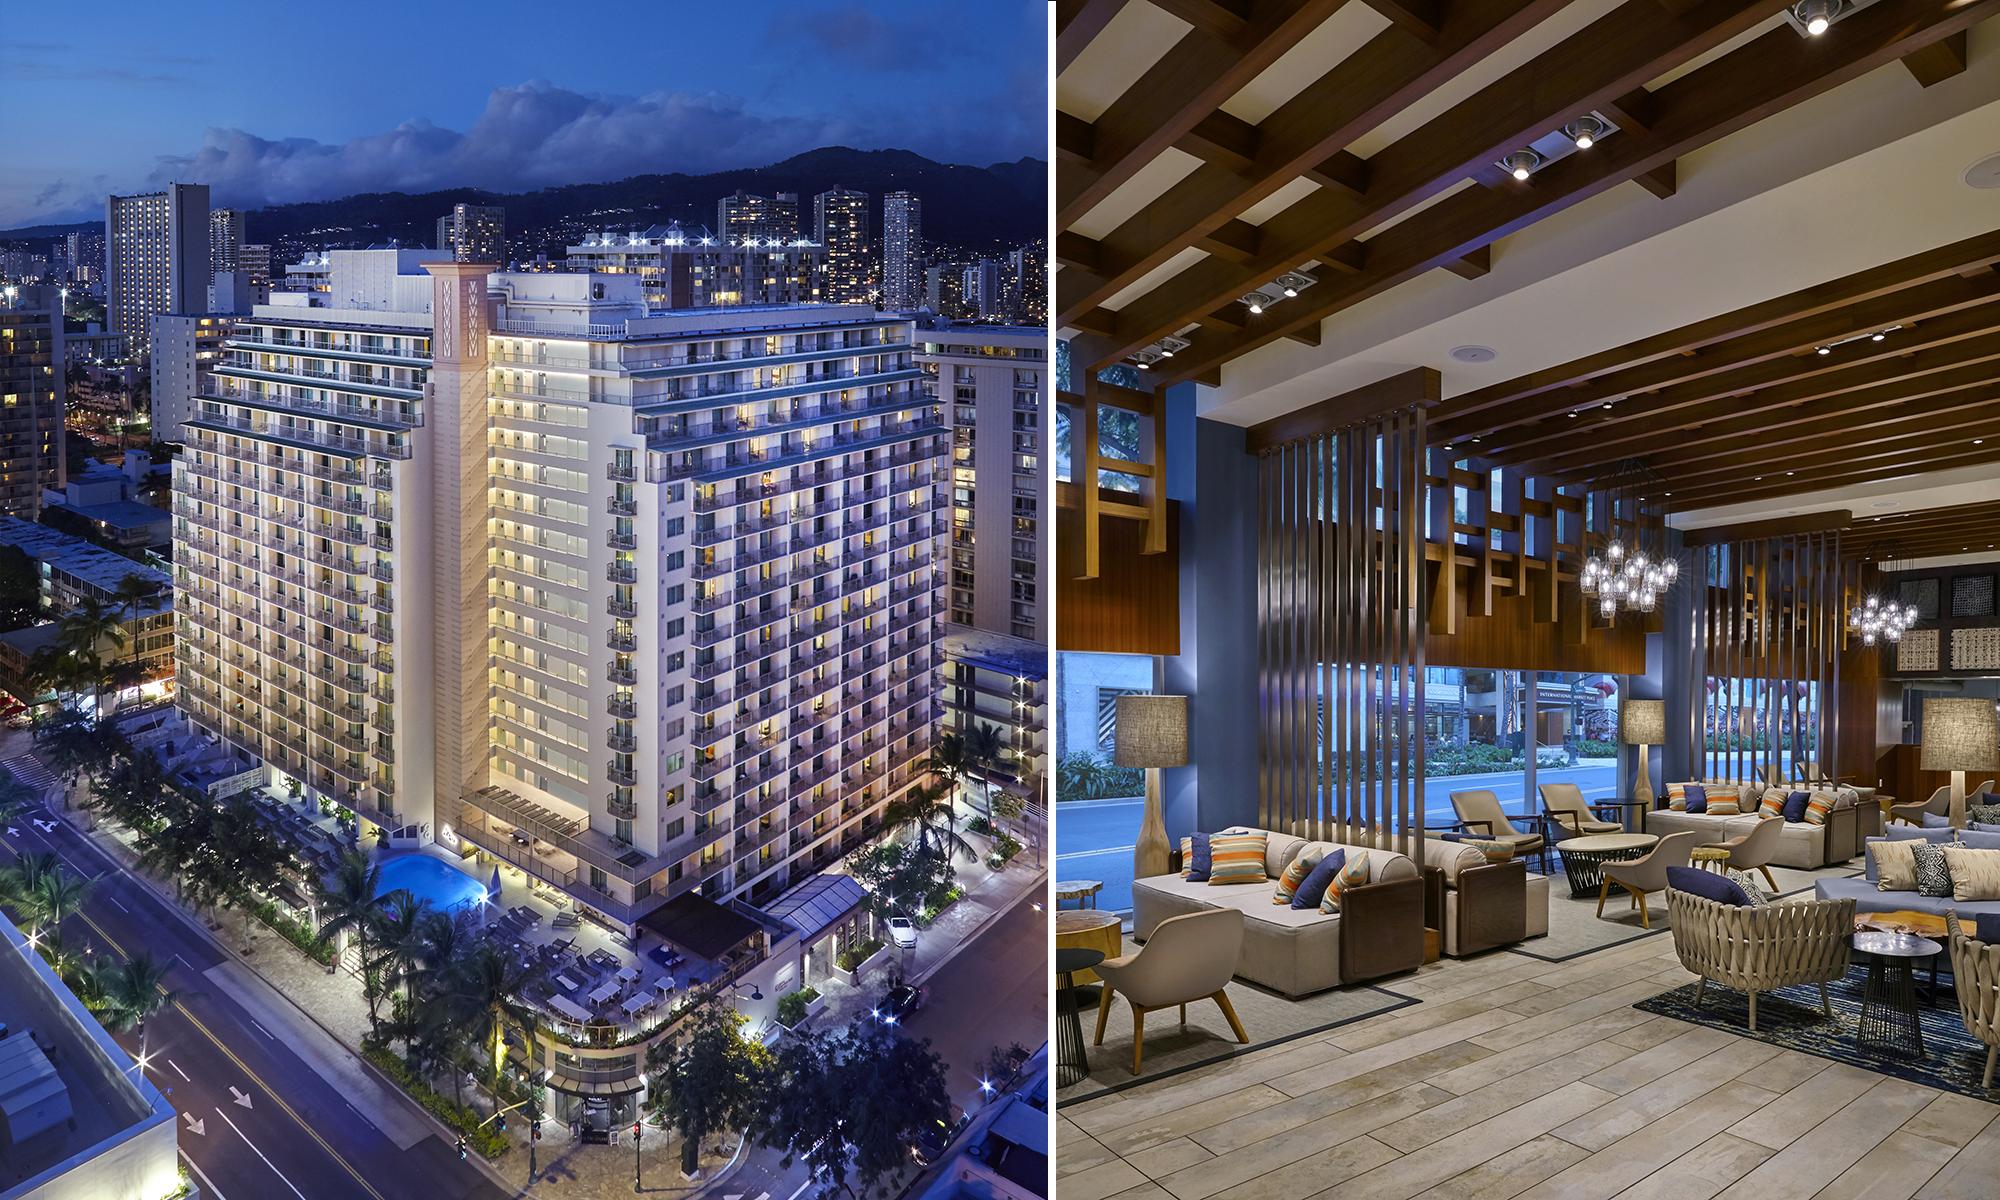 Hilton Garden Inn Waikiki Beach Podium, Pool Deck, Guestroom Renovation